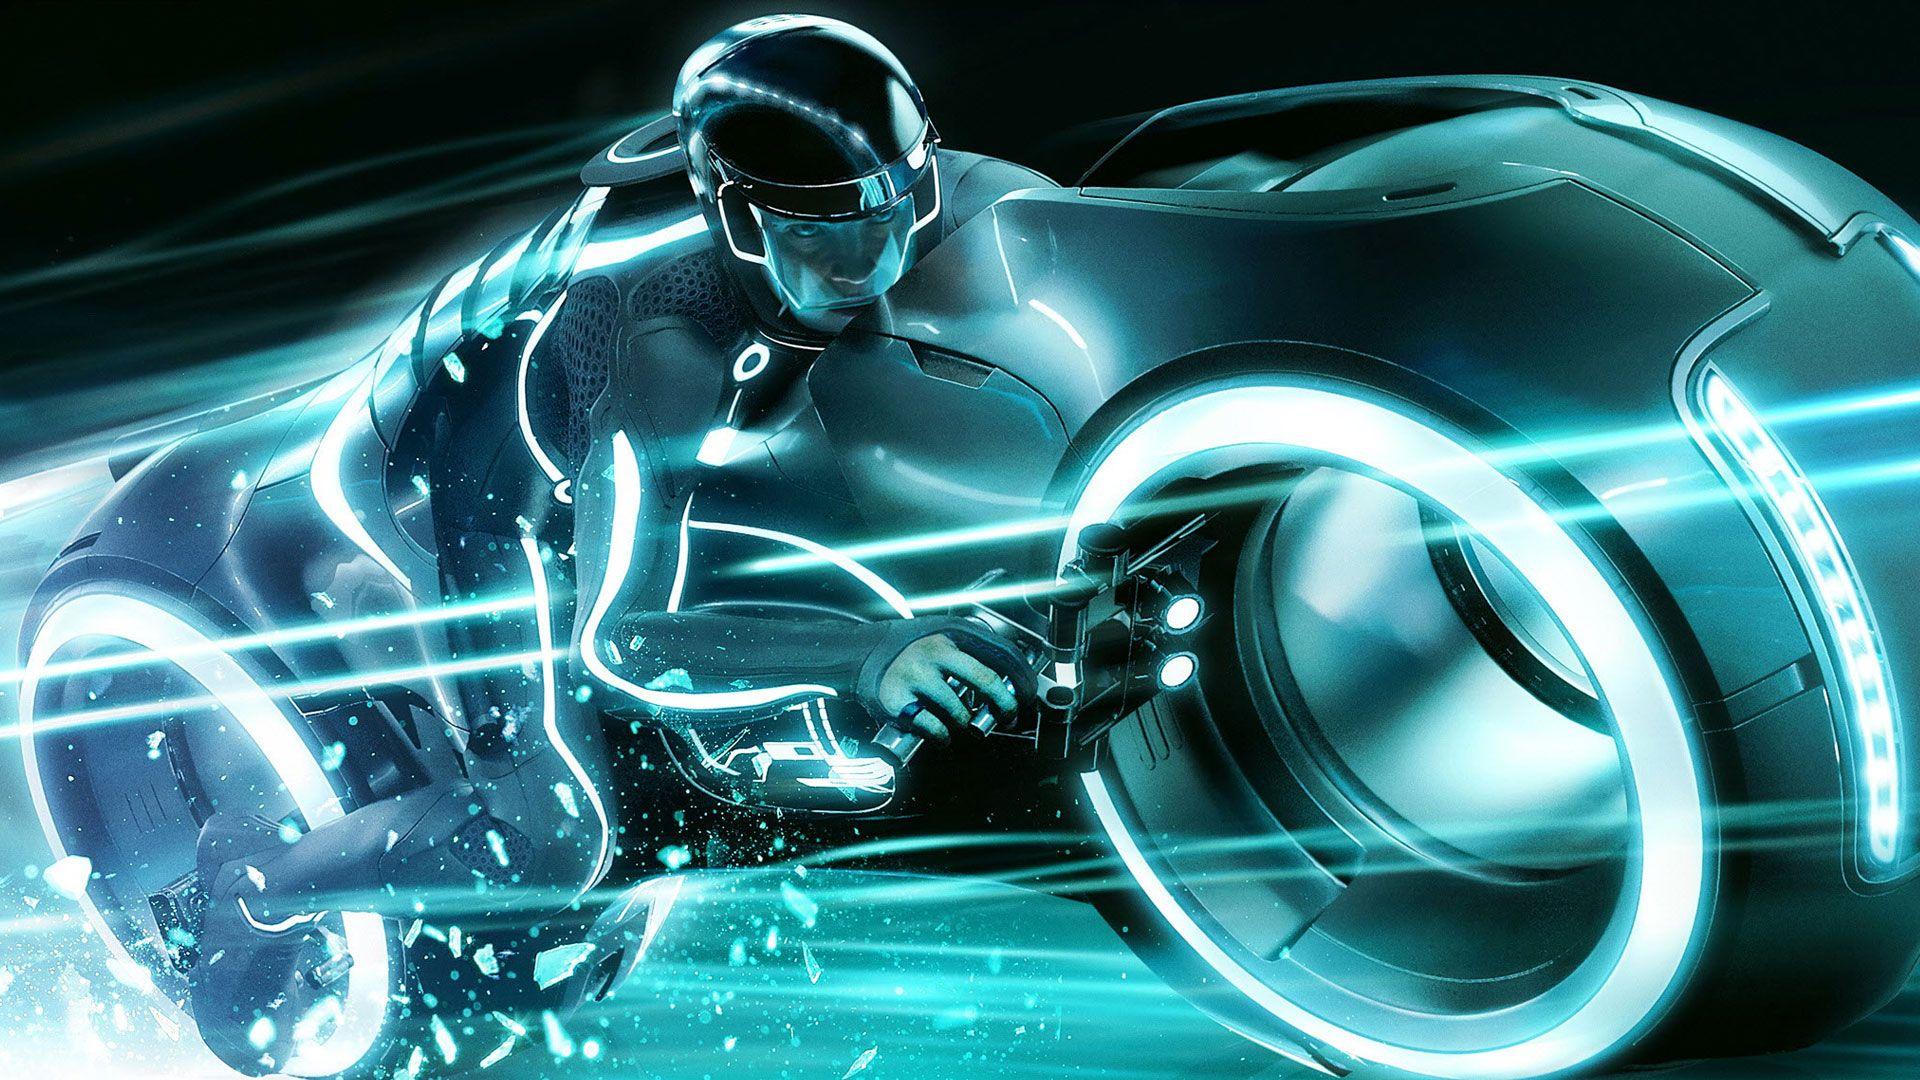 Hd Wallpapers 1080p Tron Legacy Hd 1080p Wallpapers Hd Wallpapers Tron Legacy Tron Bike Tron